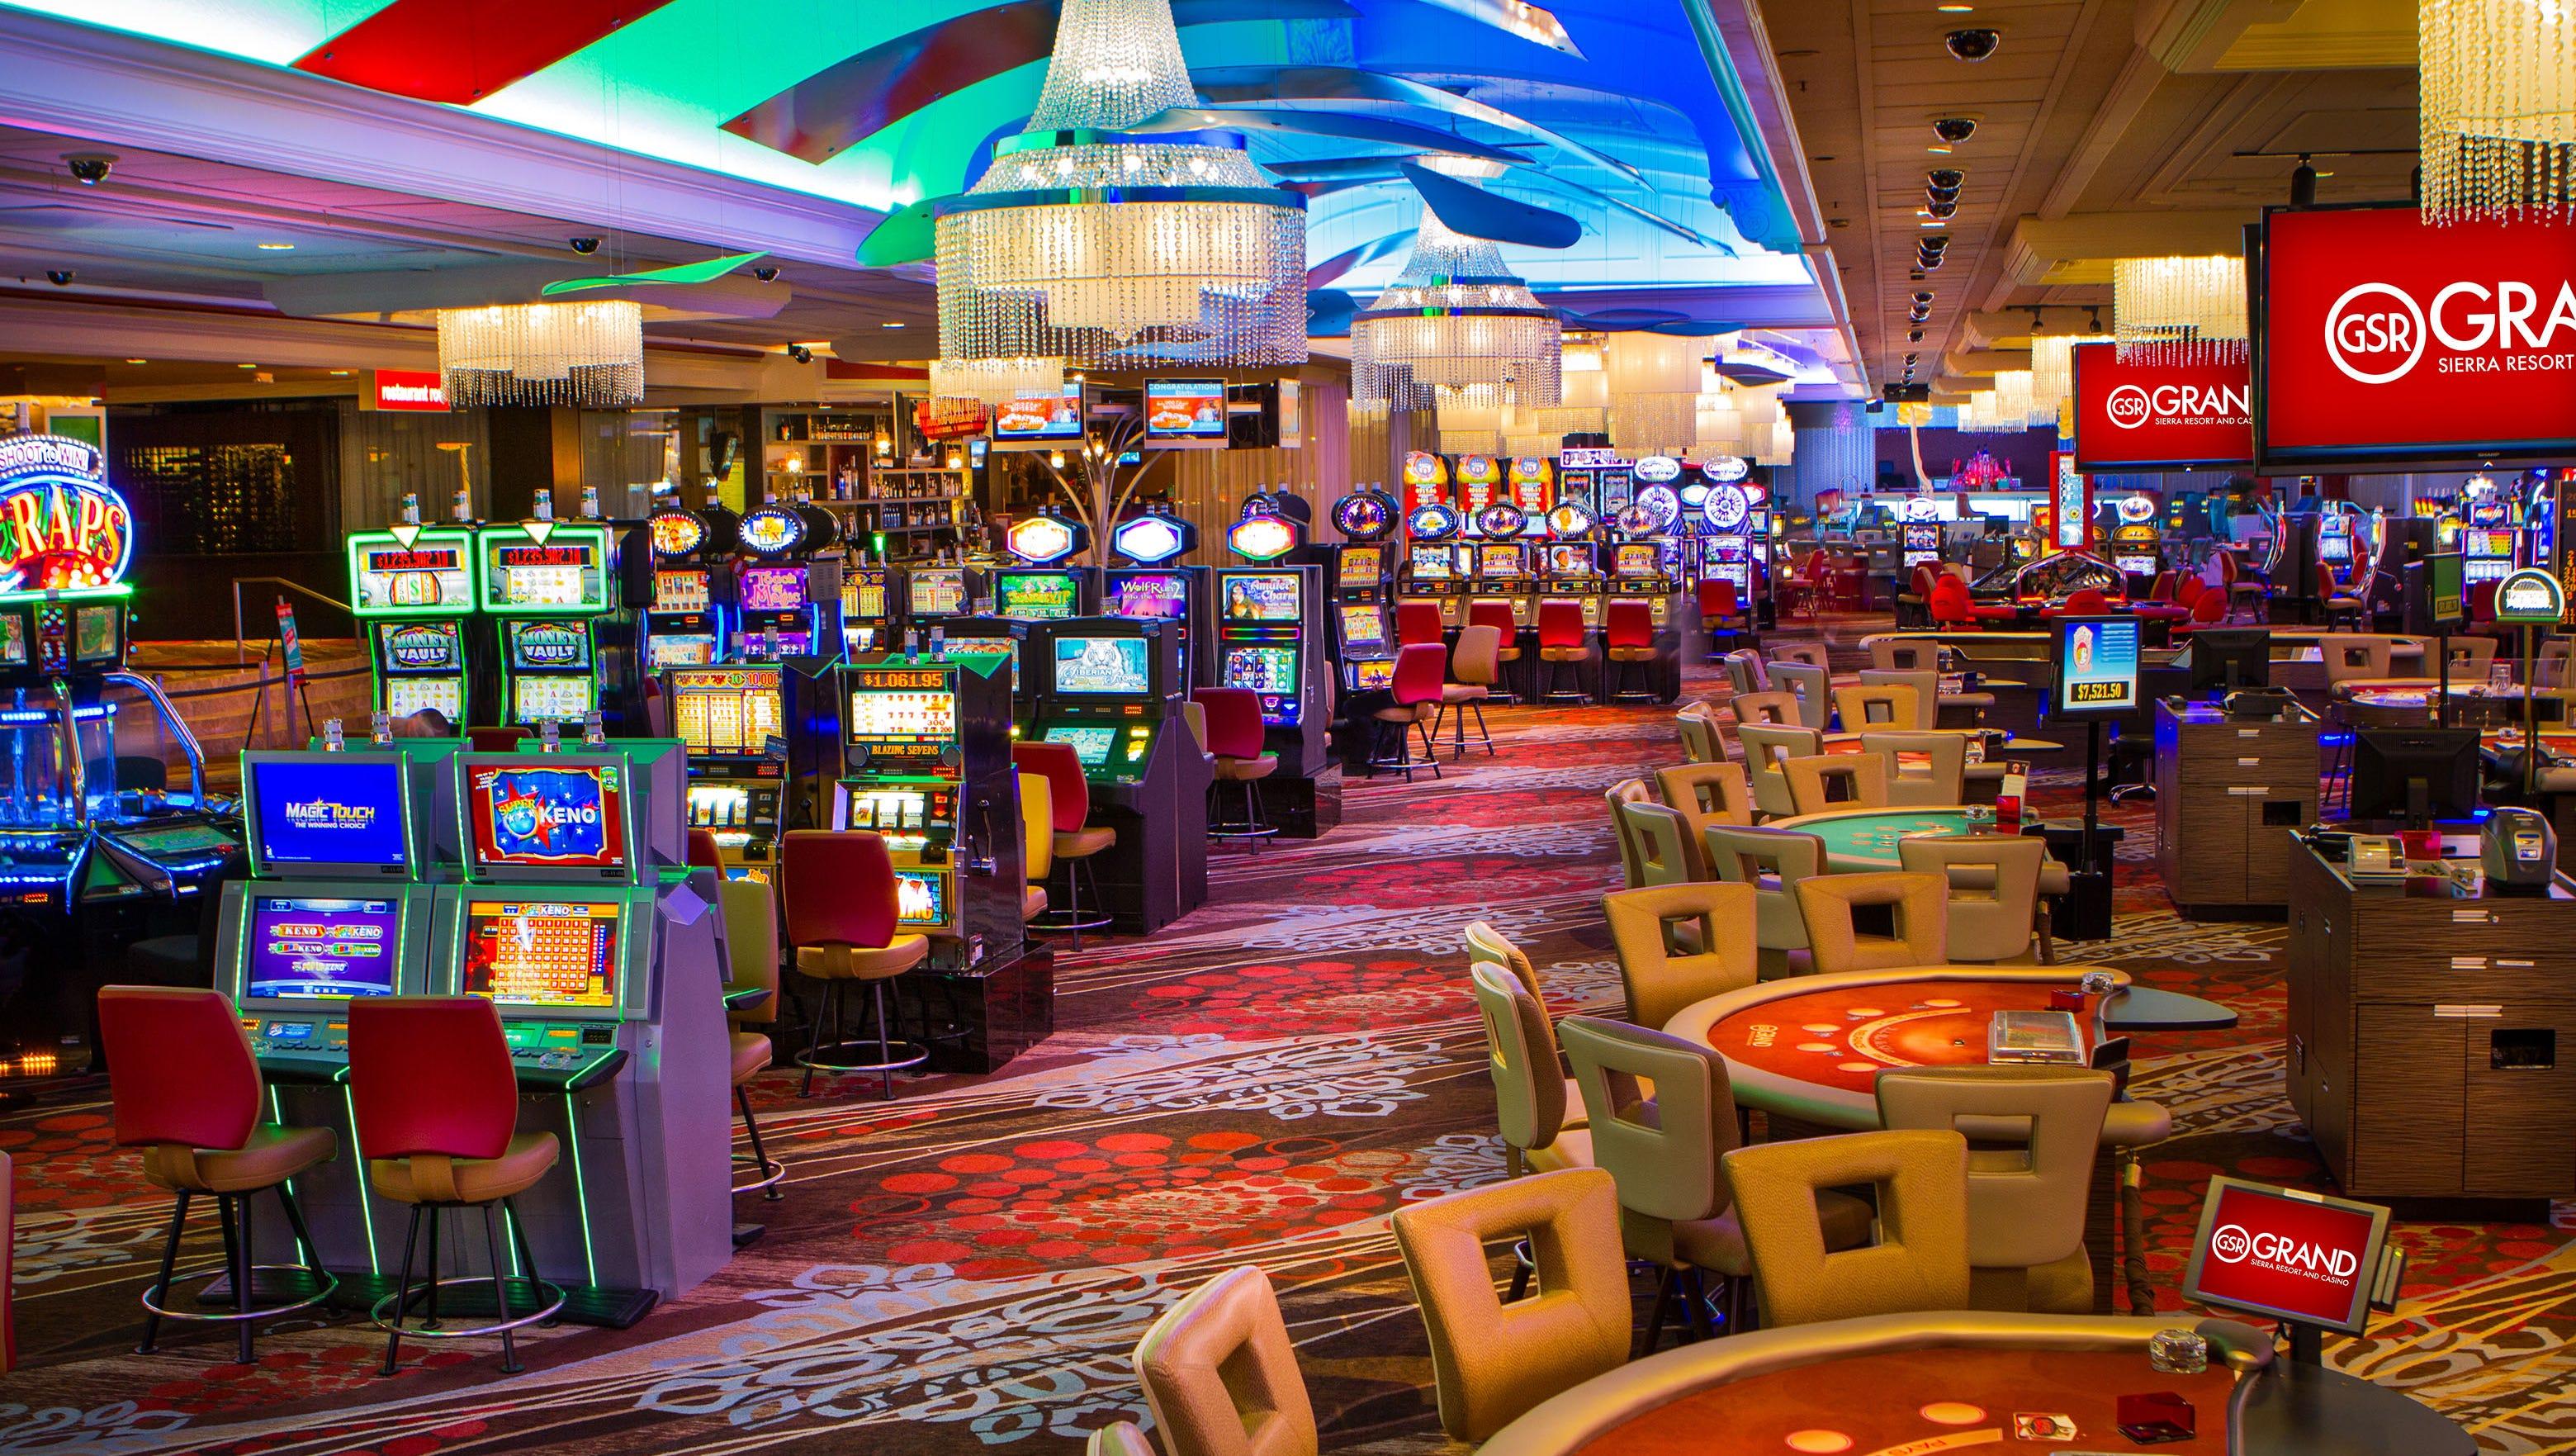 Grand sierra casino in reno nevada video gambling